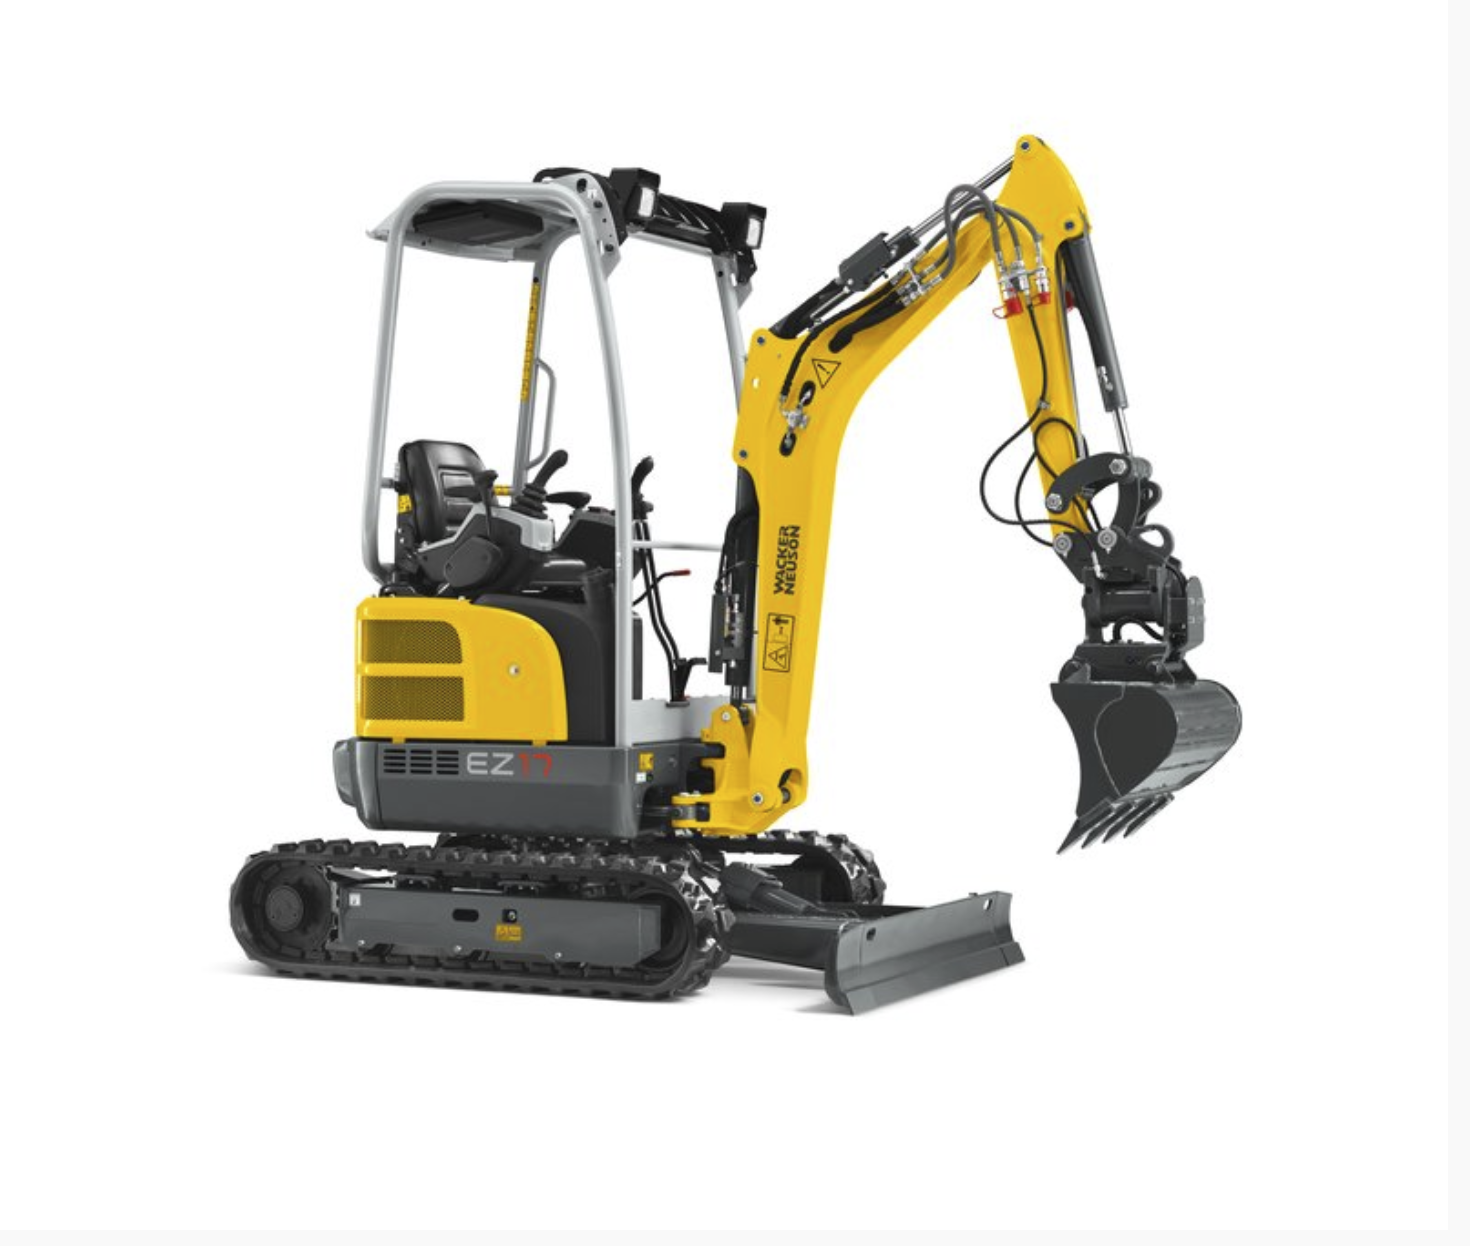 Mini Excavator 39 inch, 1.5 tonne Image